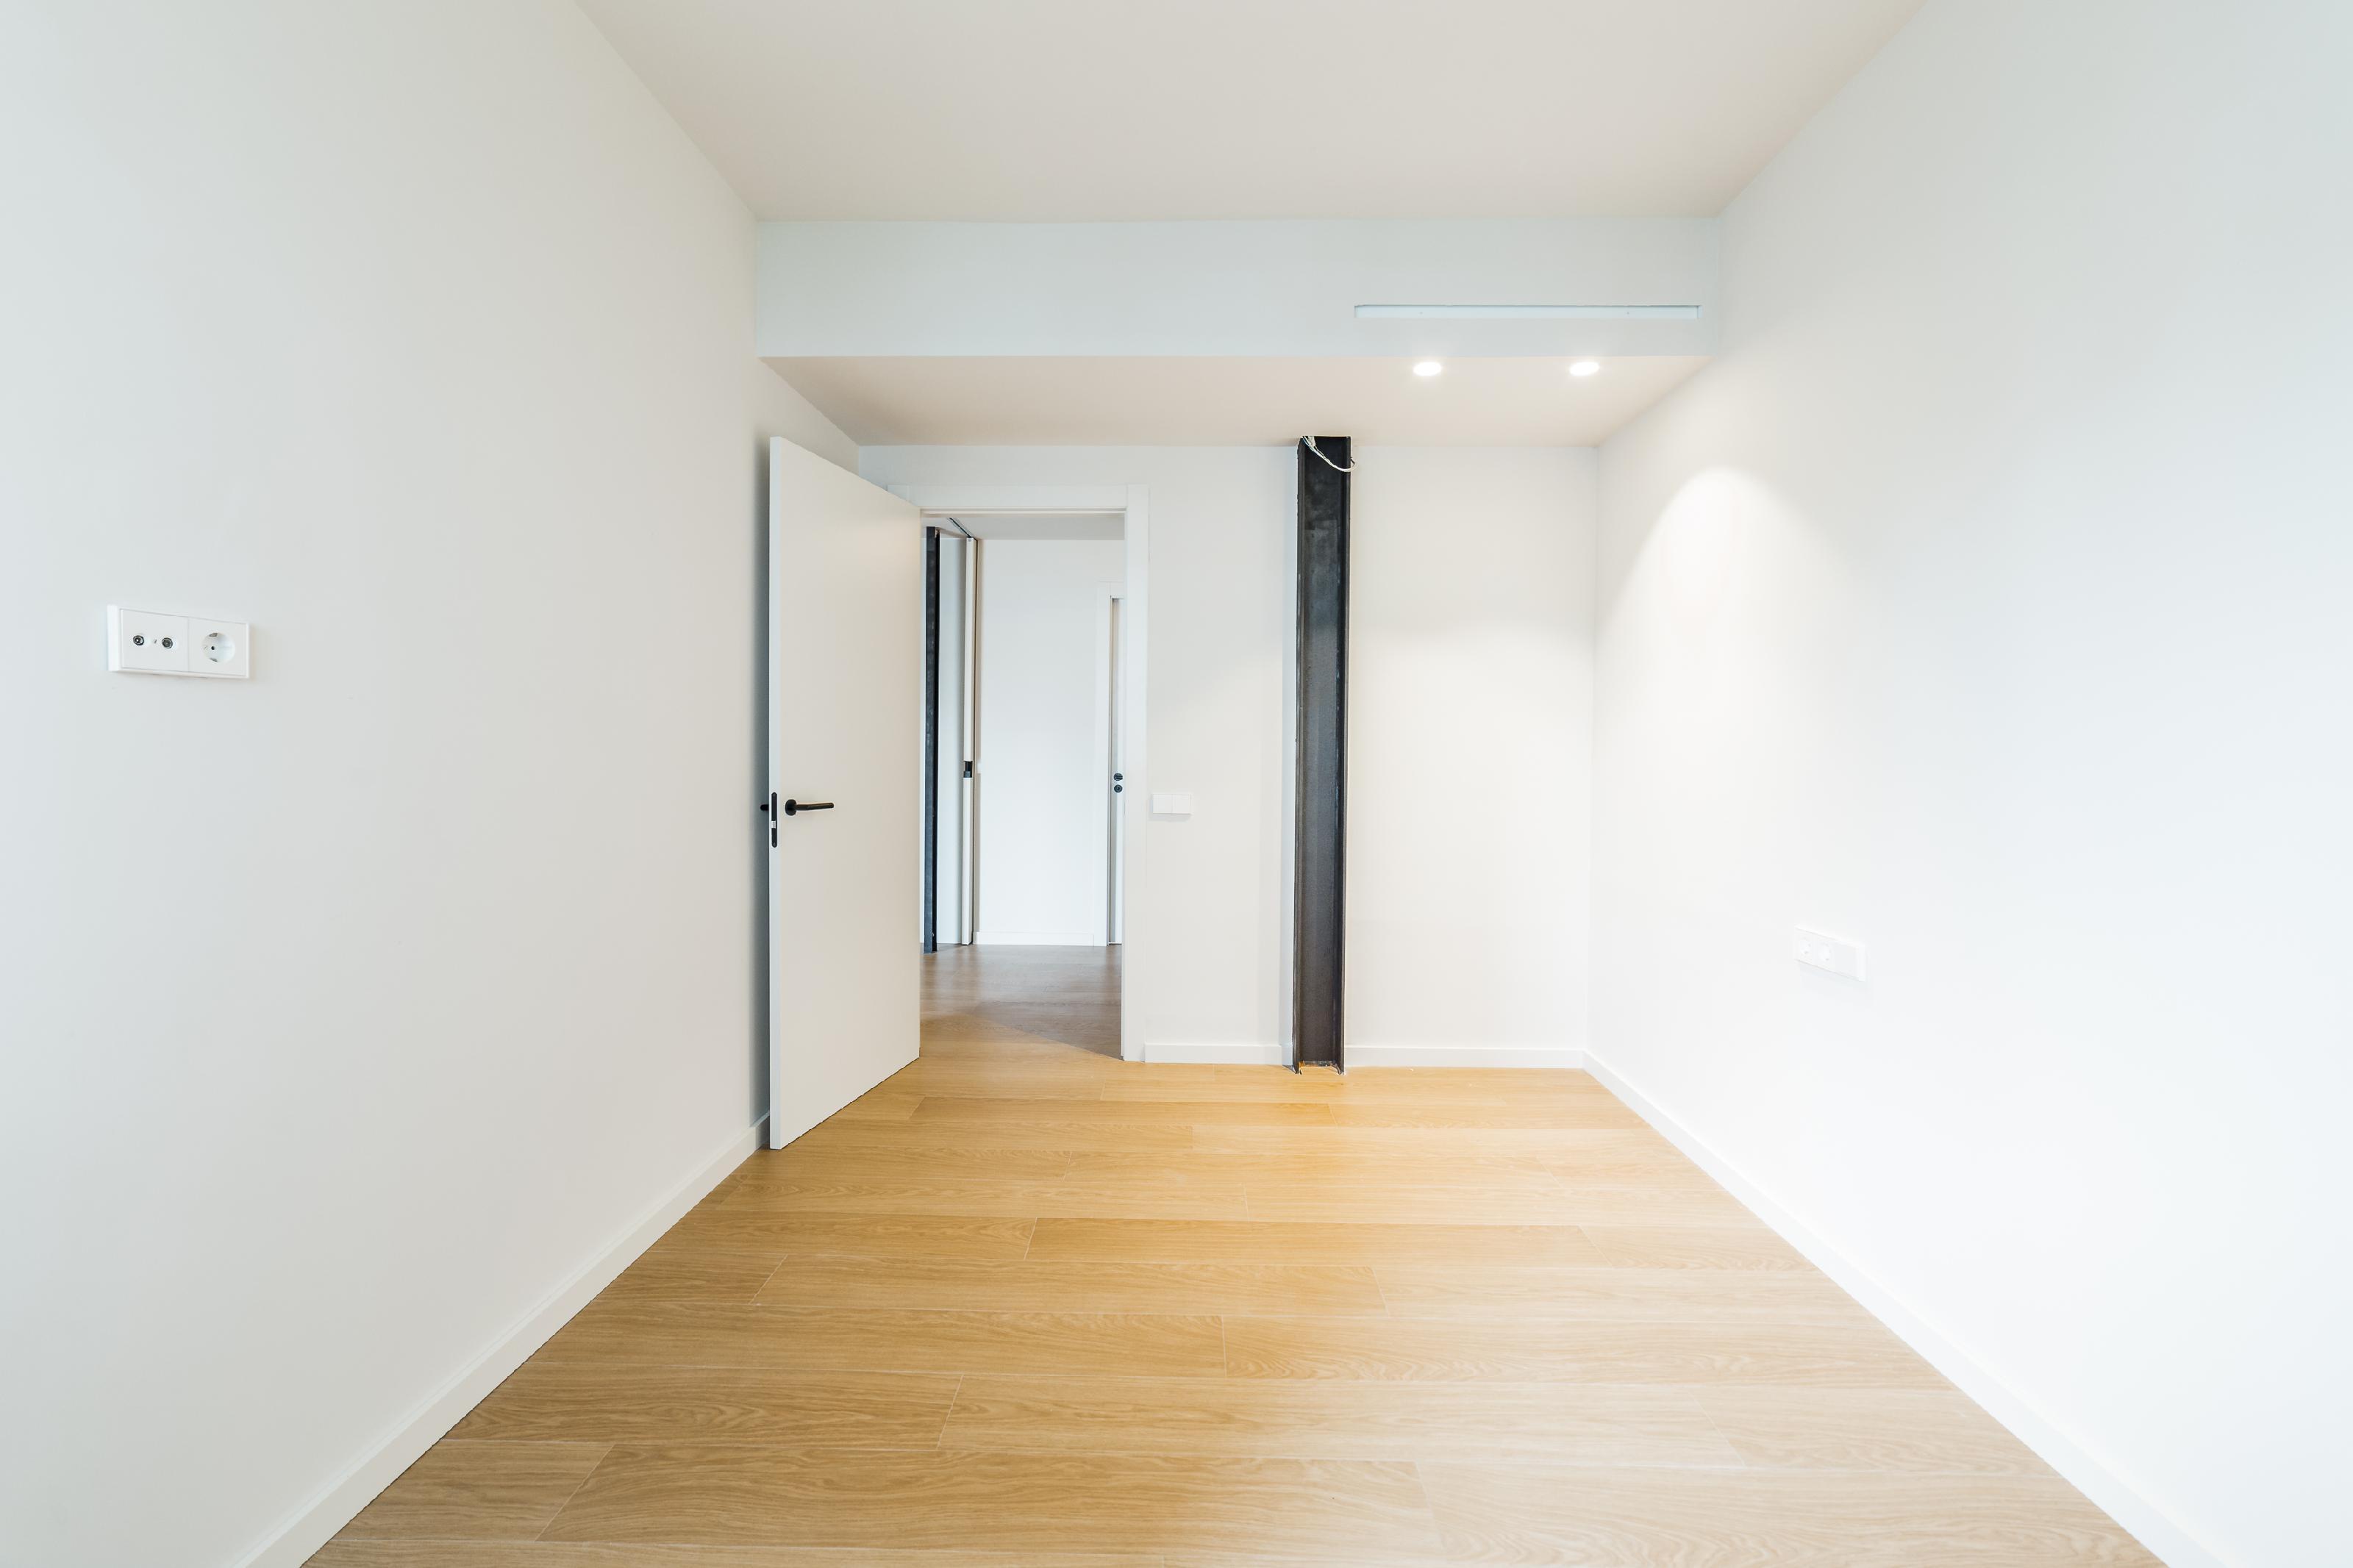 253492 Flat for sale in Sarrià-Sant Gervasi, Sant Gervasi-Galvany 31